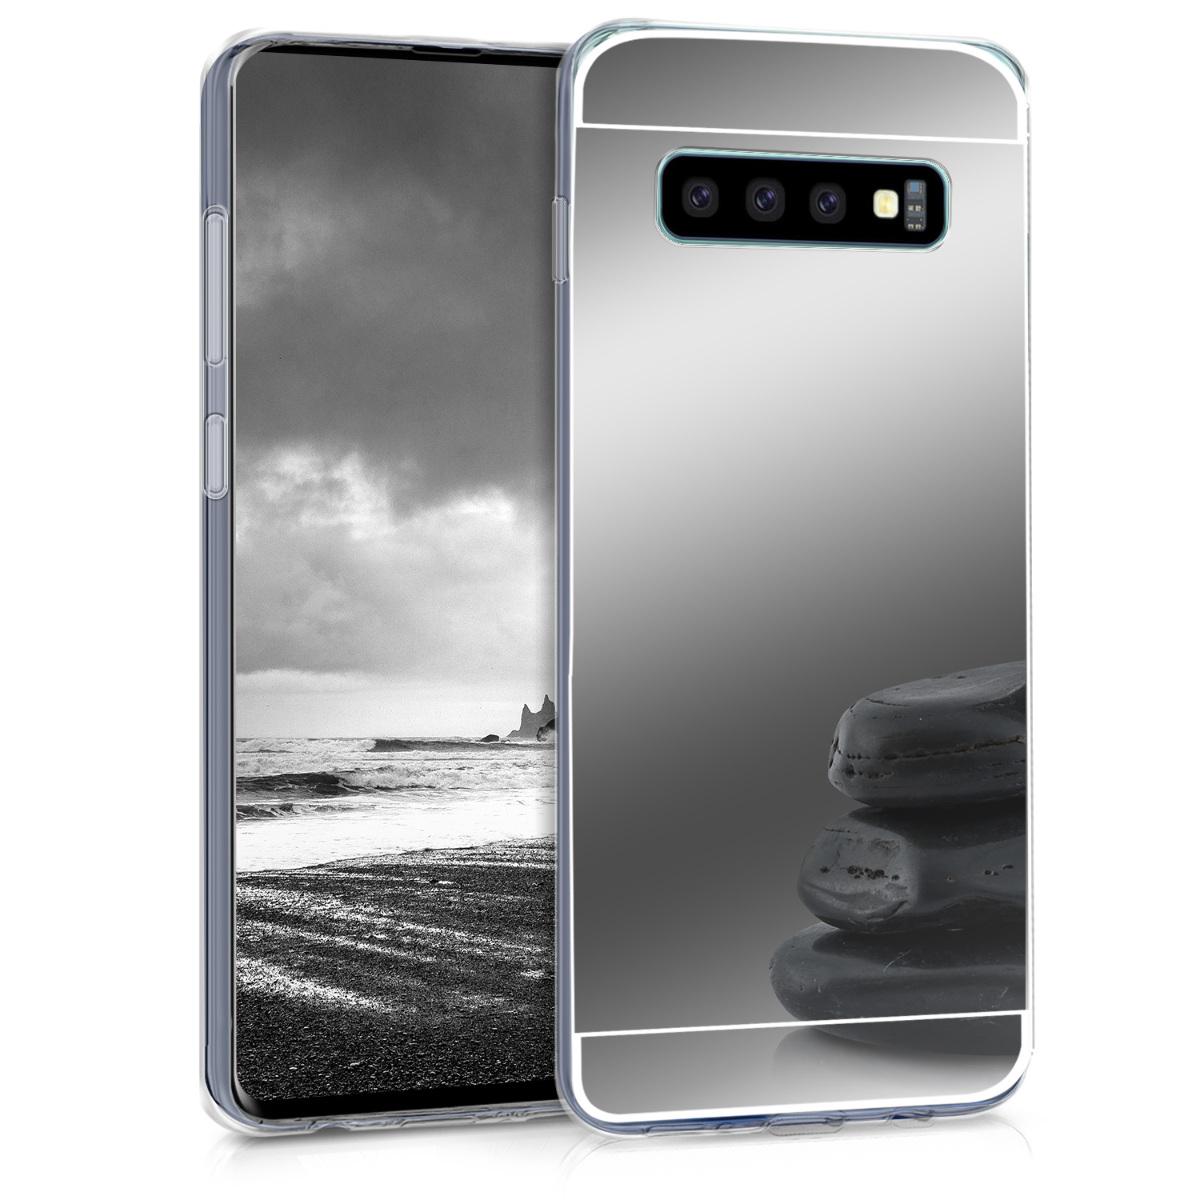 KW Θήκη Σιλικόνης (TPU) με Καθρέφτη Samsung Galaxy S10 - Silver Reflective (47931.42)